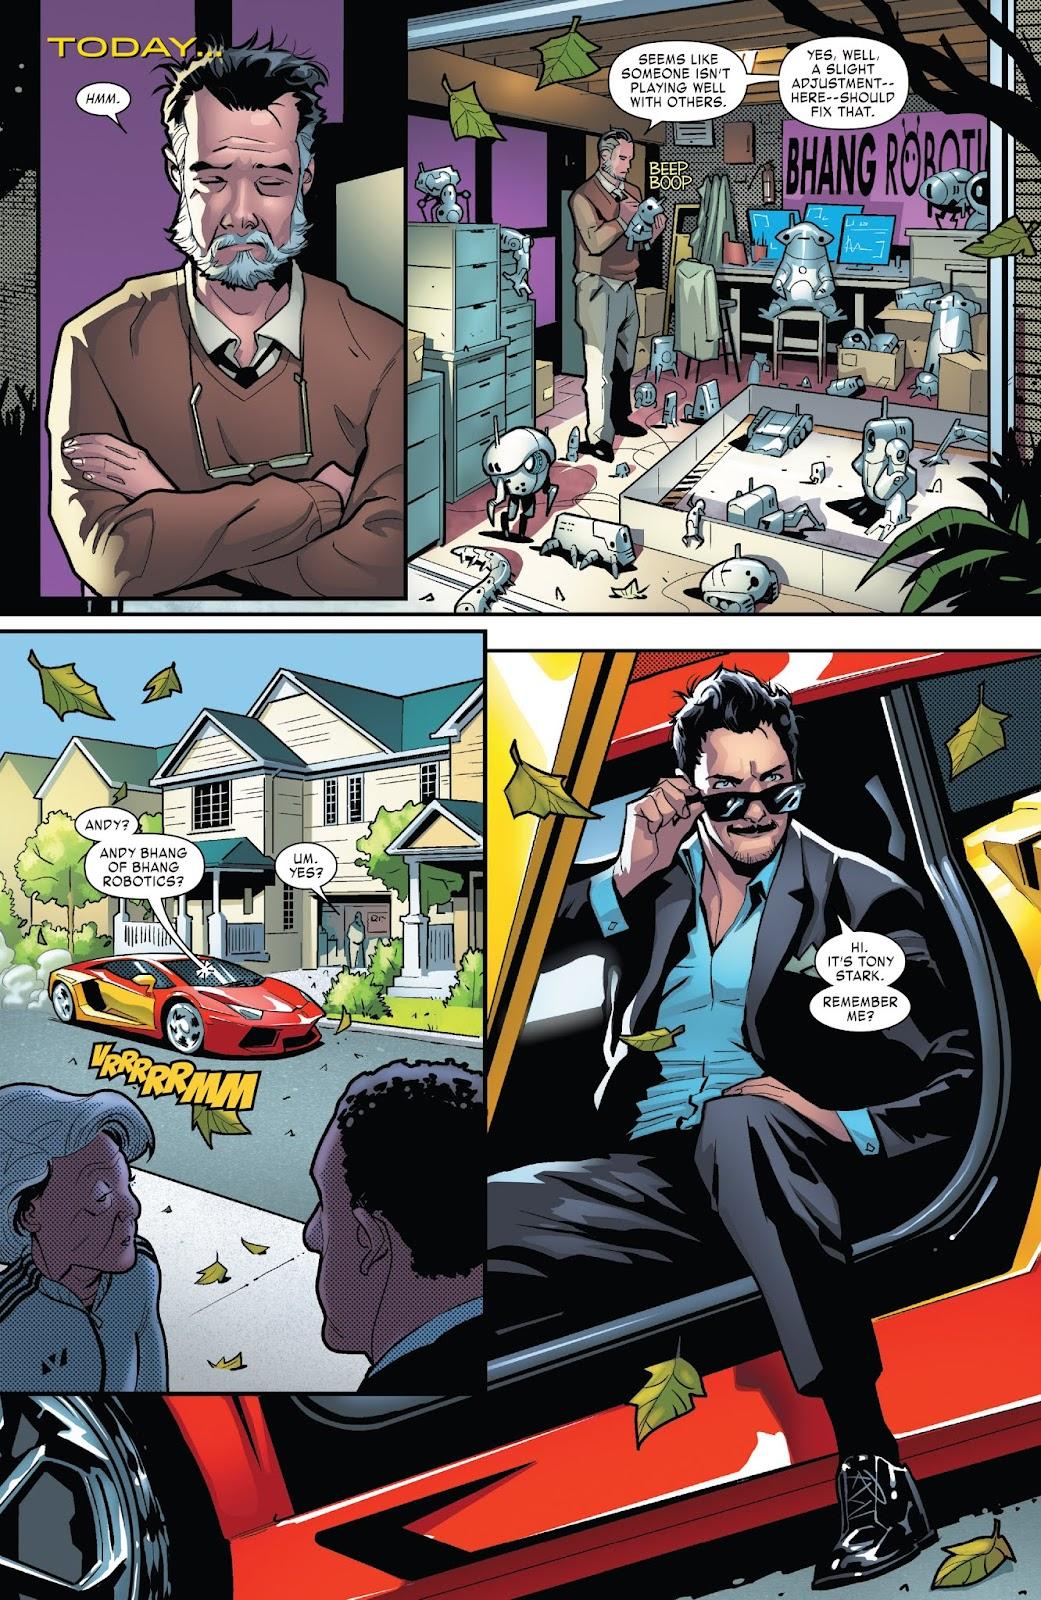 Read online Tony Stark: Iron Man comic -  Issue #1 - 5